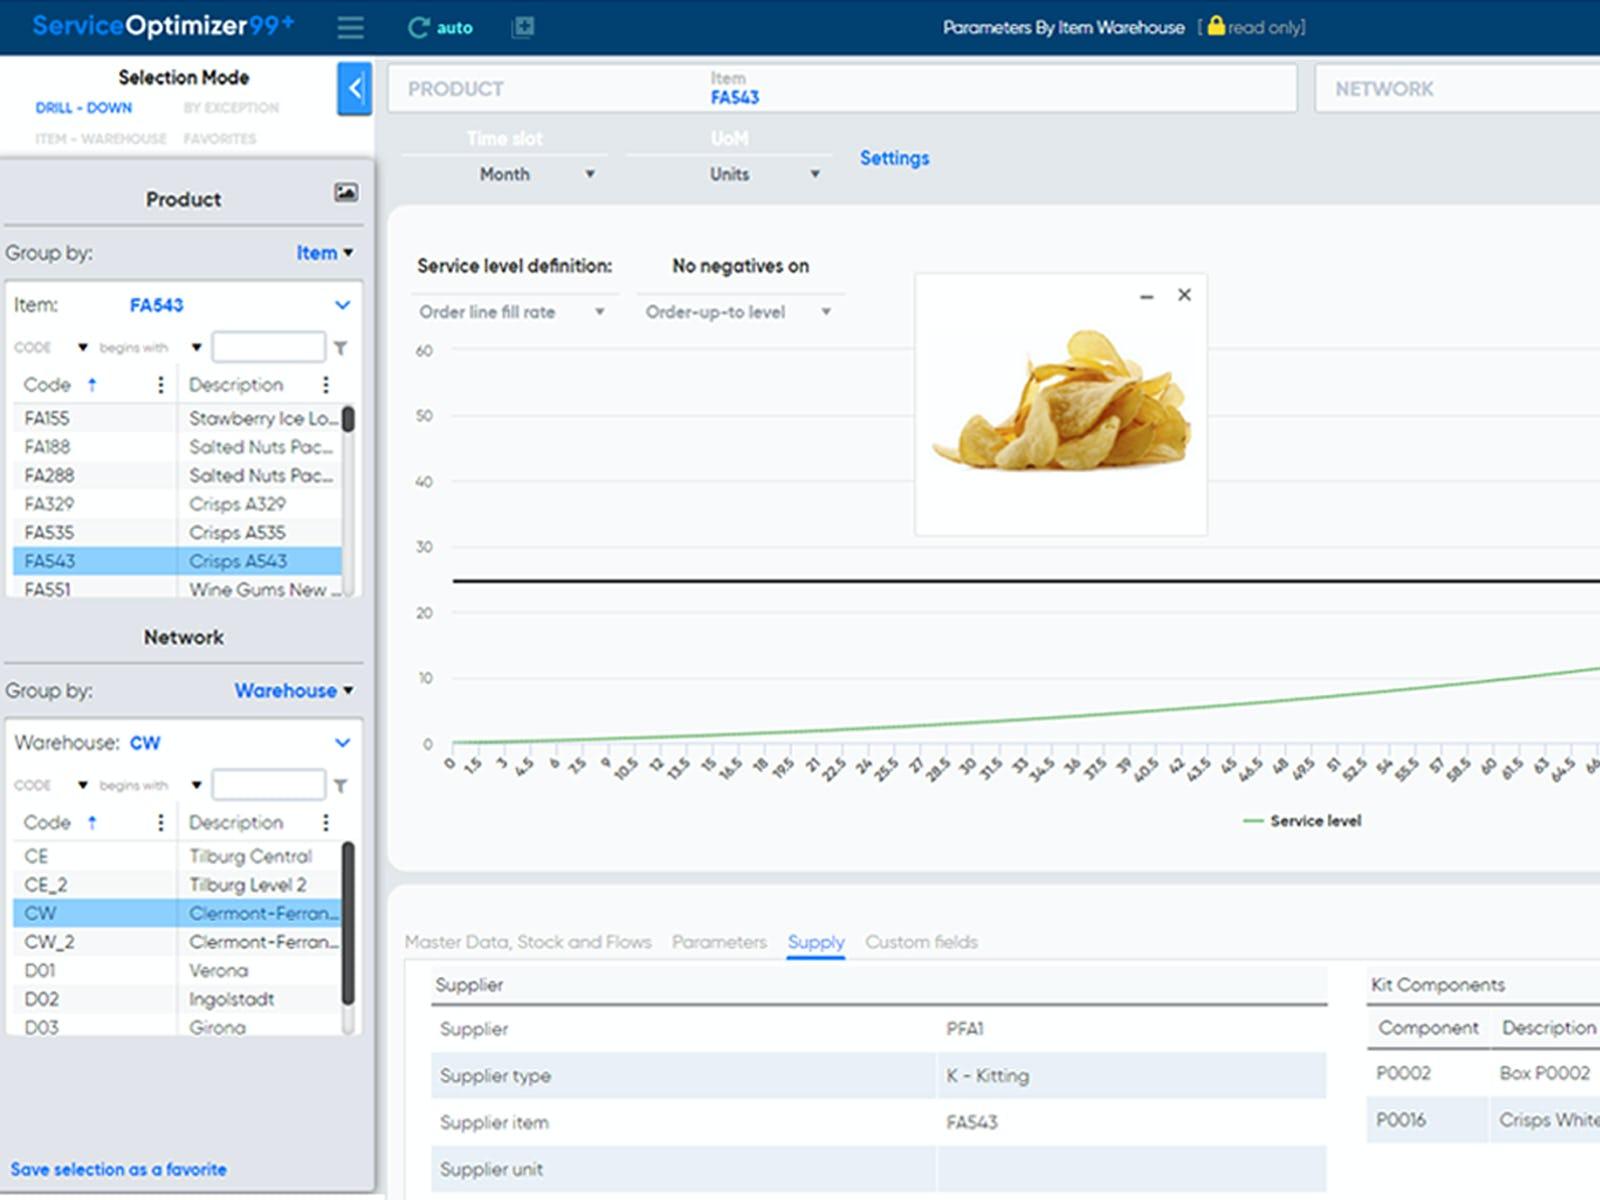 SO99+ Software - Service-Level Optimization